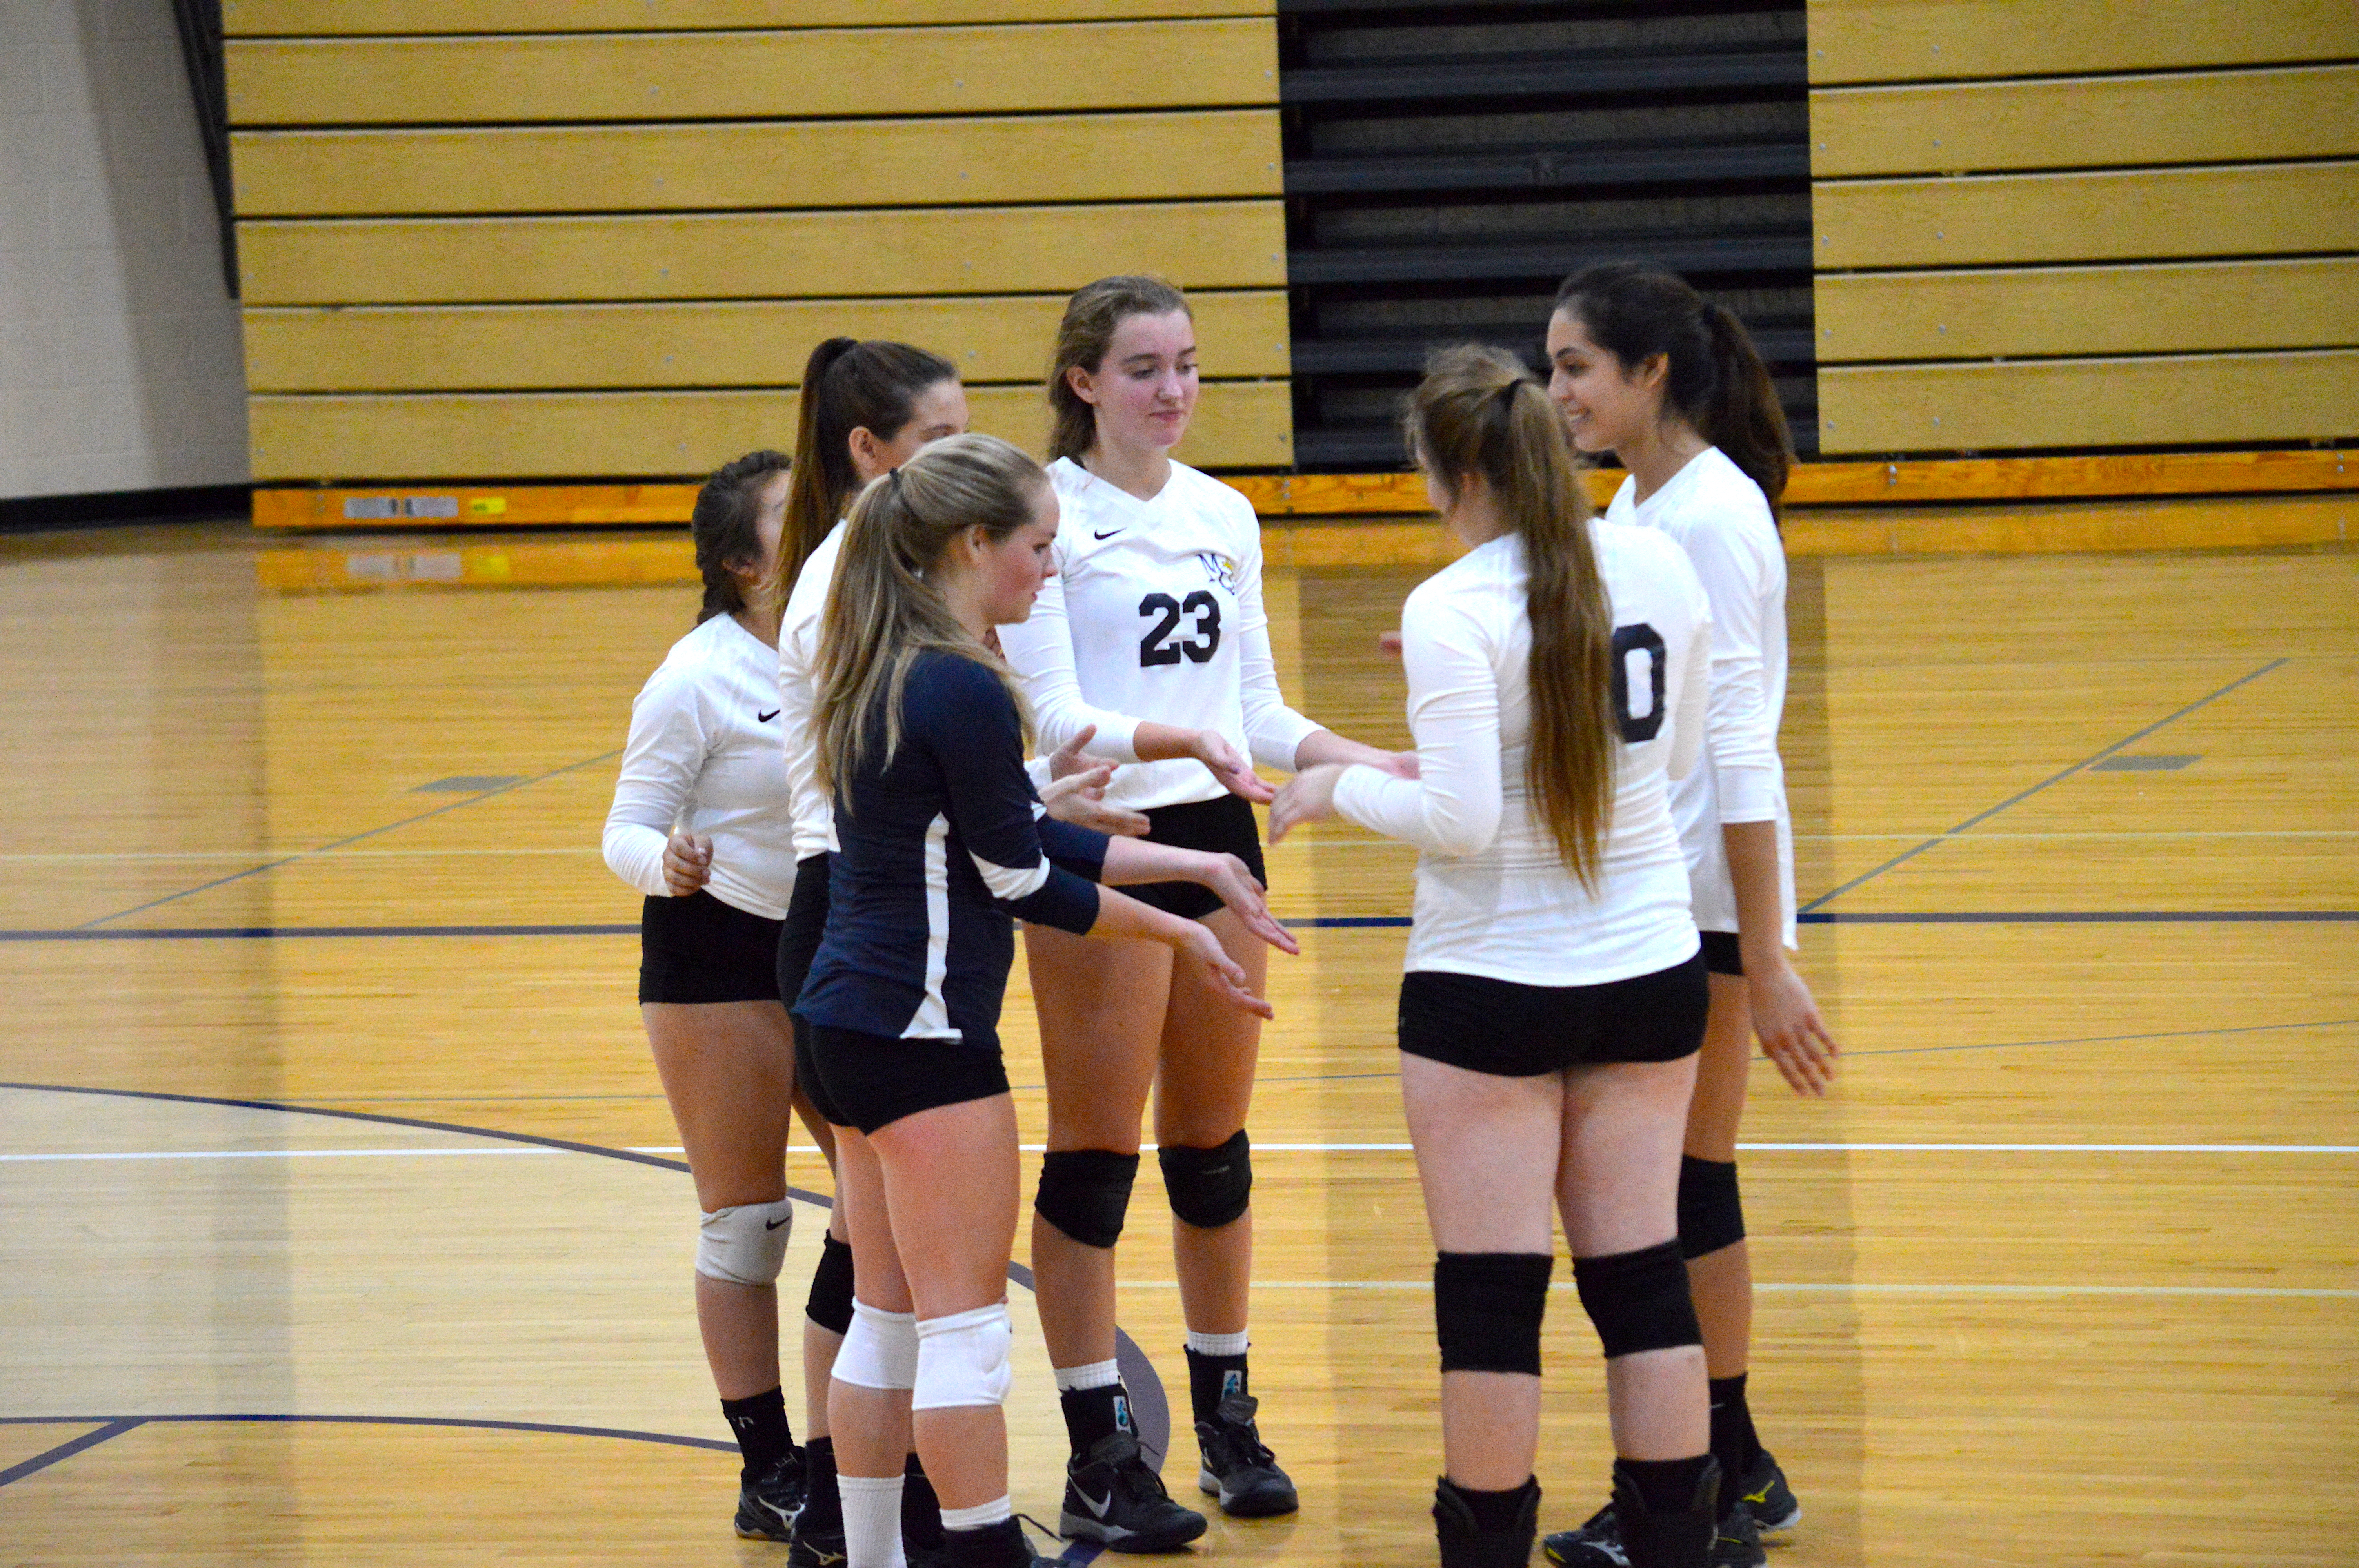 Volleyball Season Concludes at Morgan Township